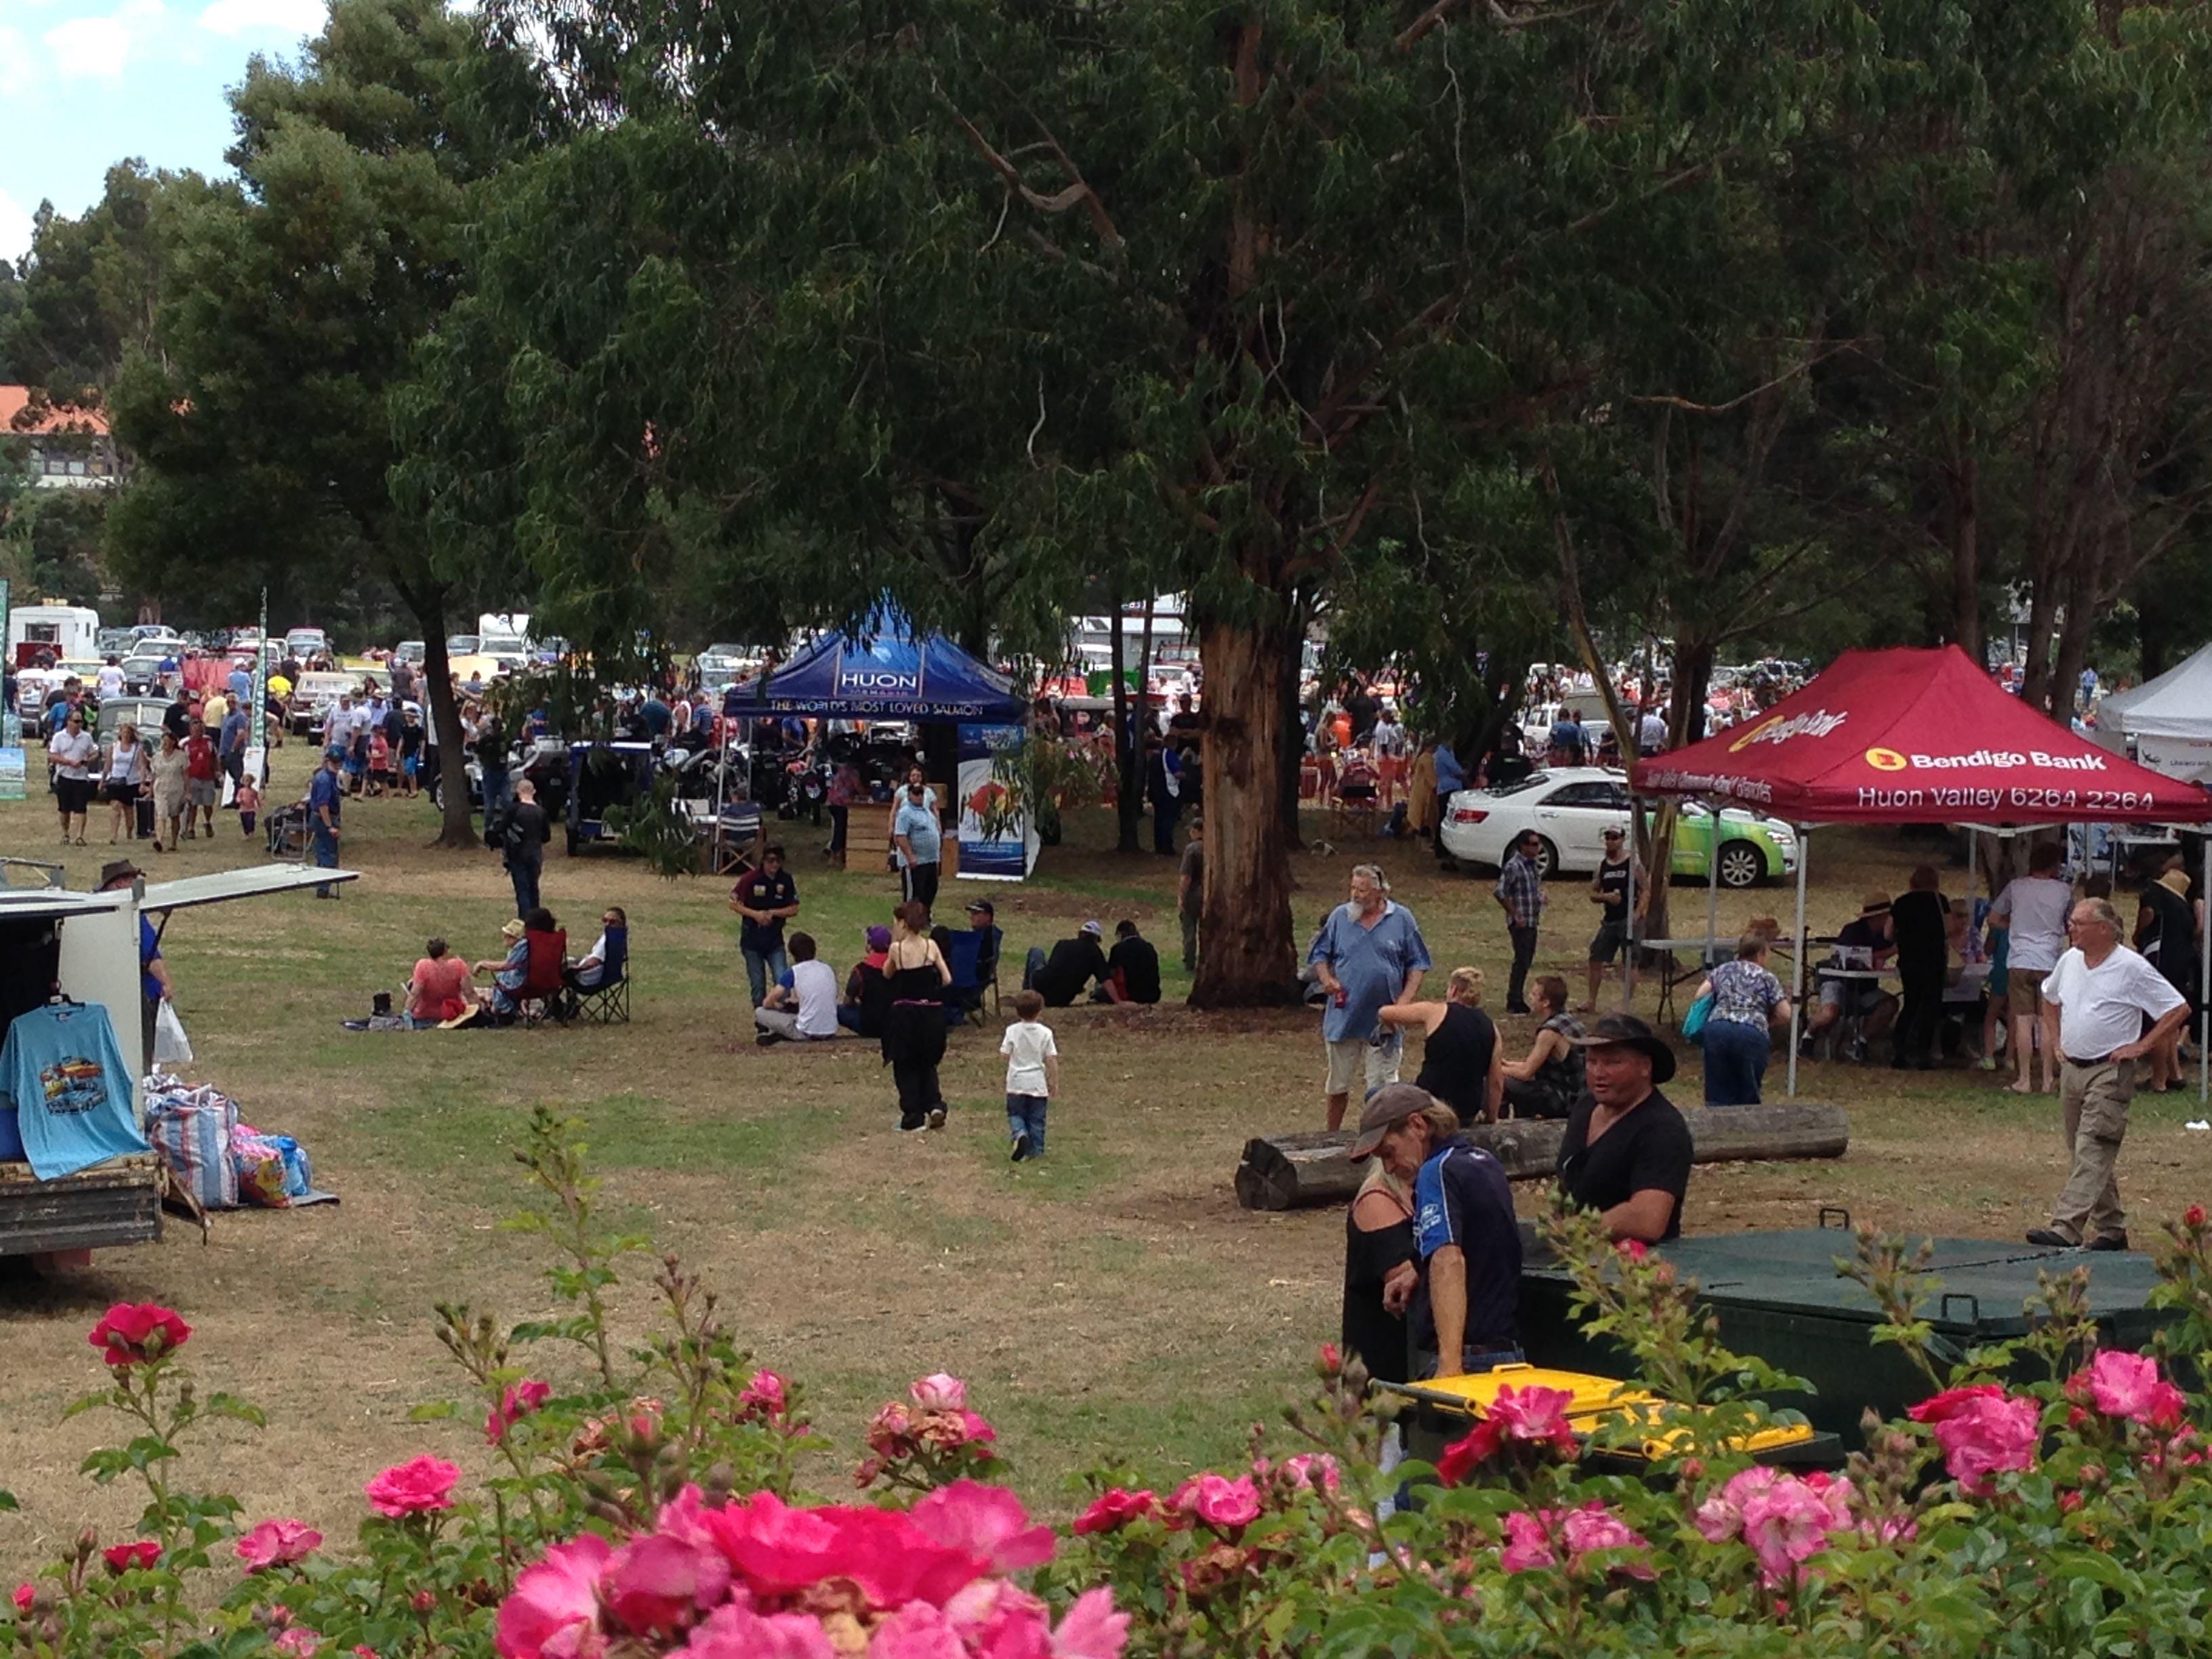 Community fun in Heritage Park